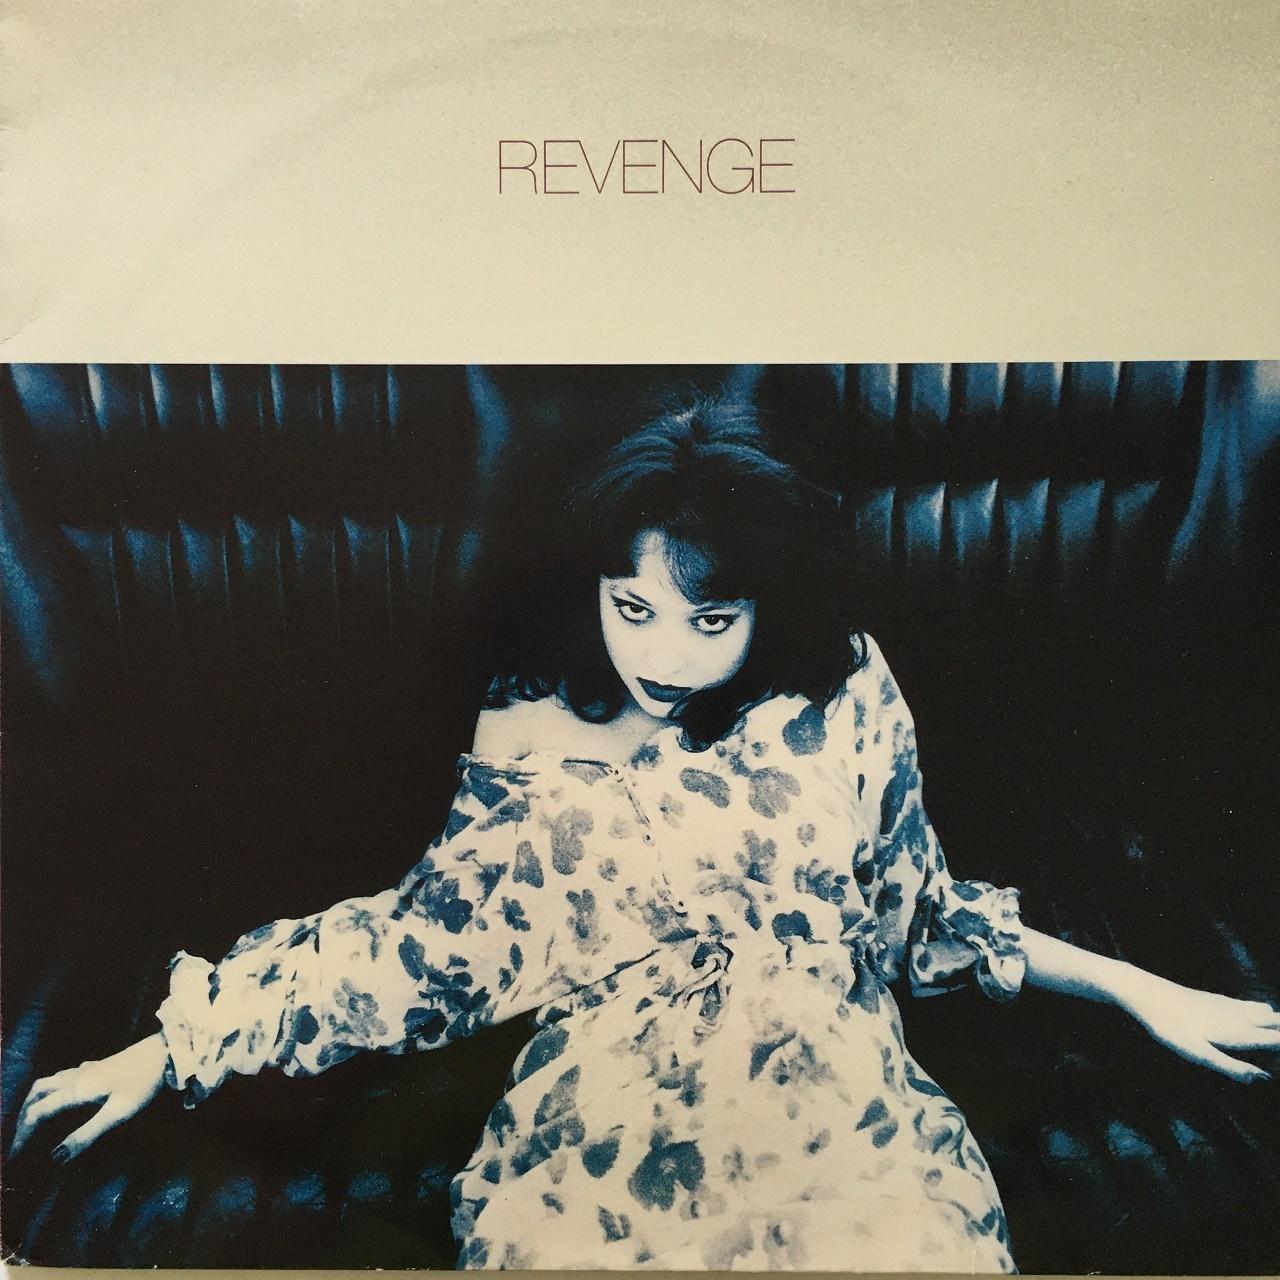 【12inch・英盤】Revenge / 7 Reasons